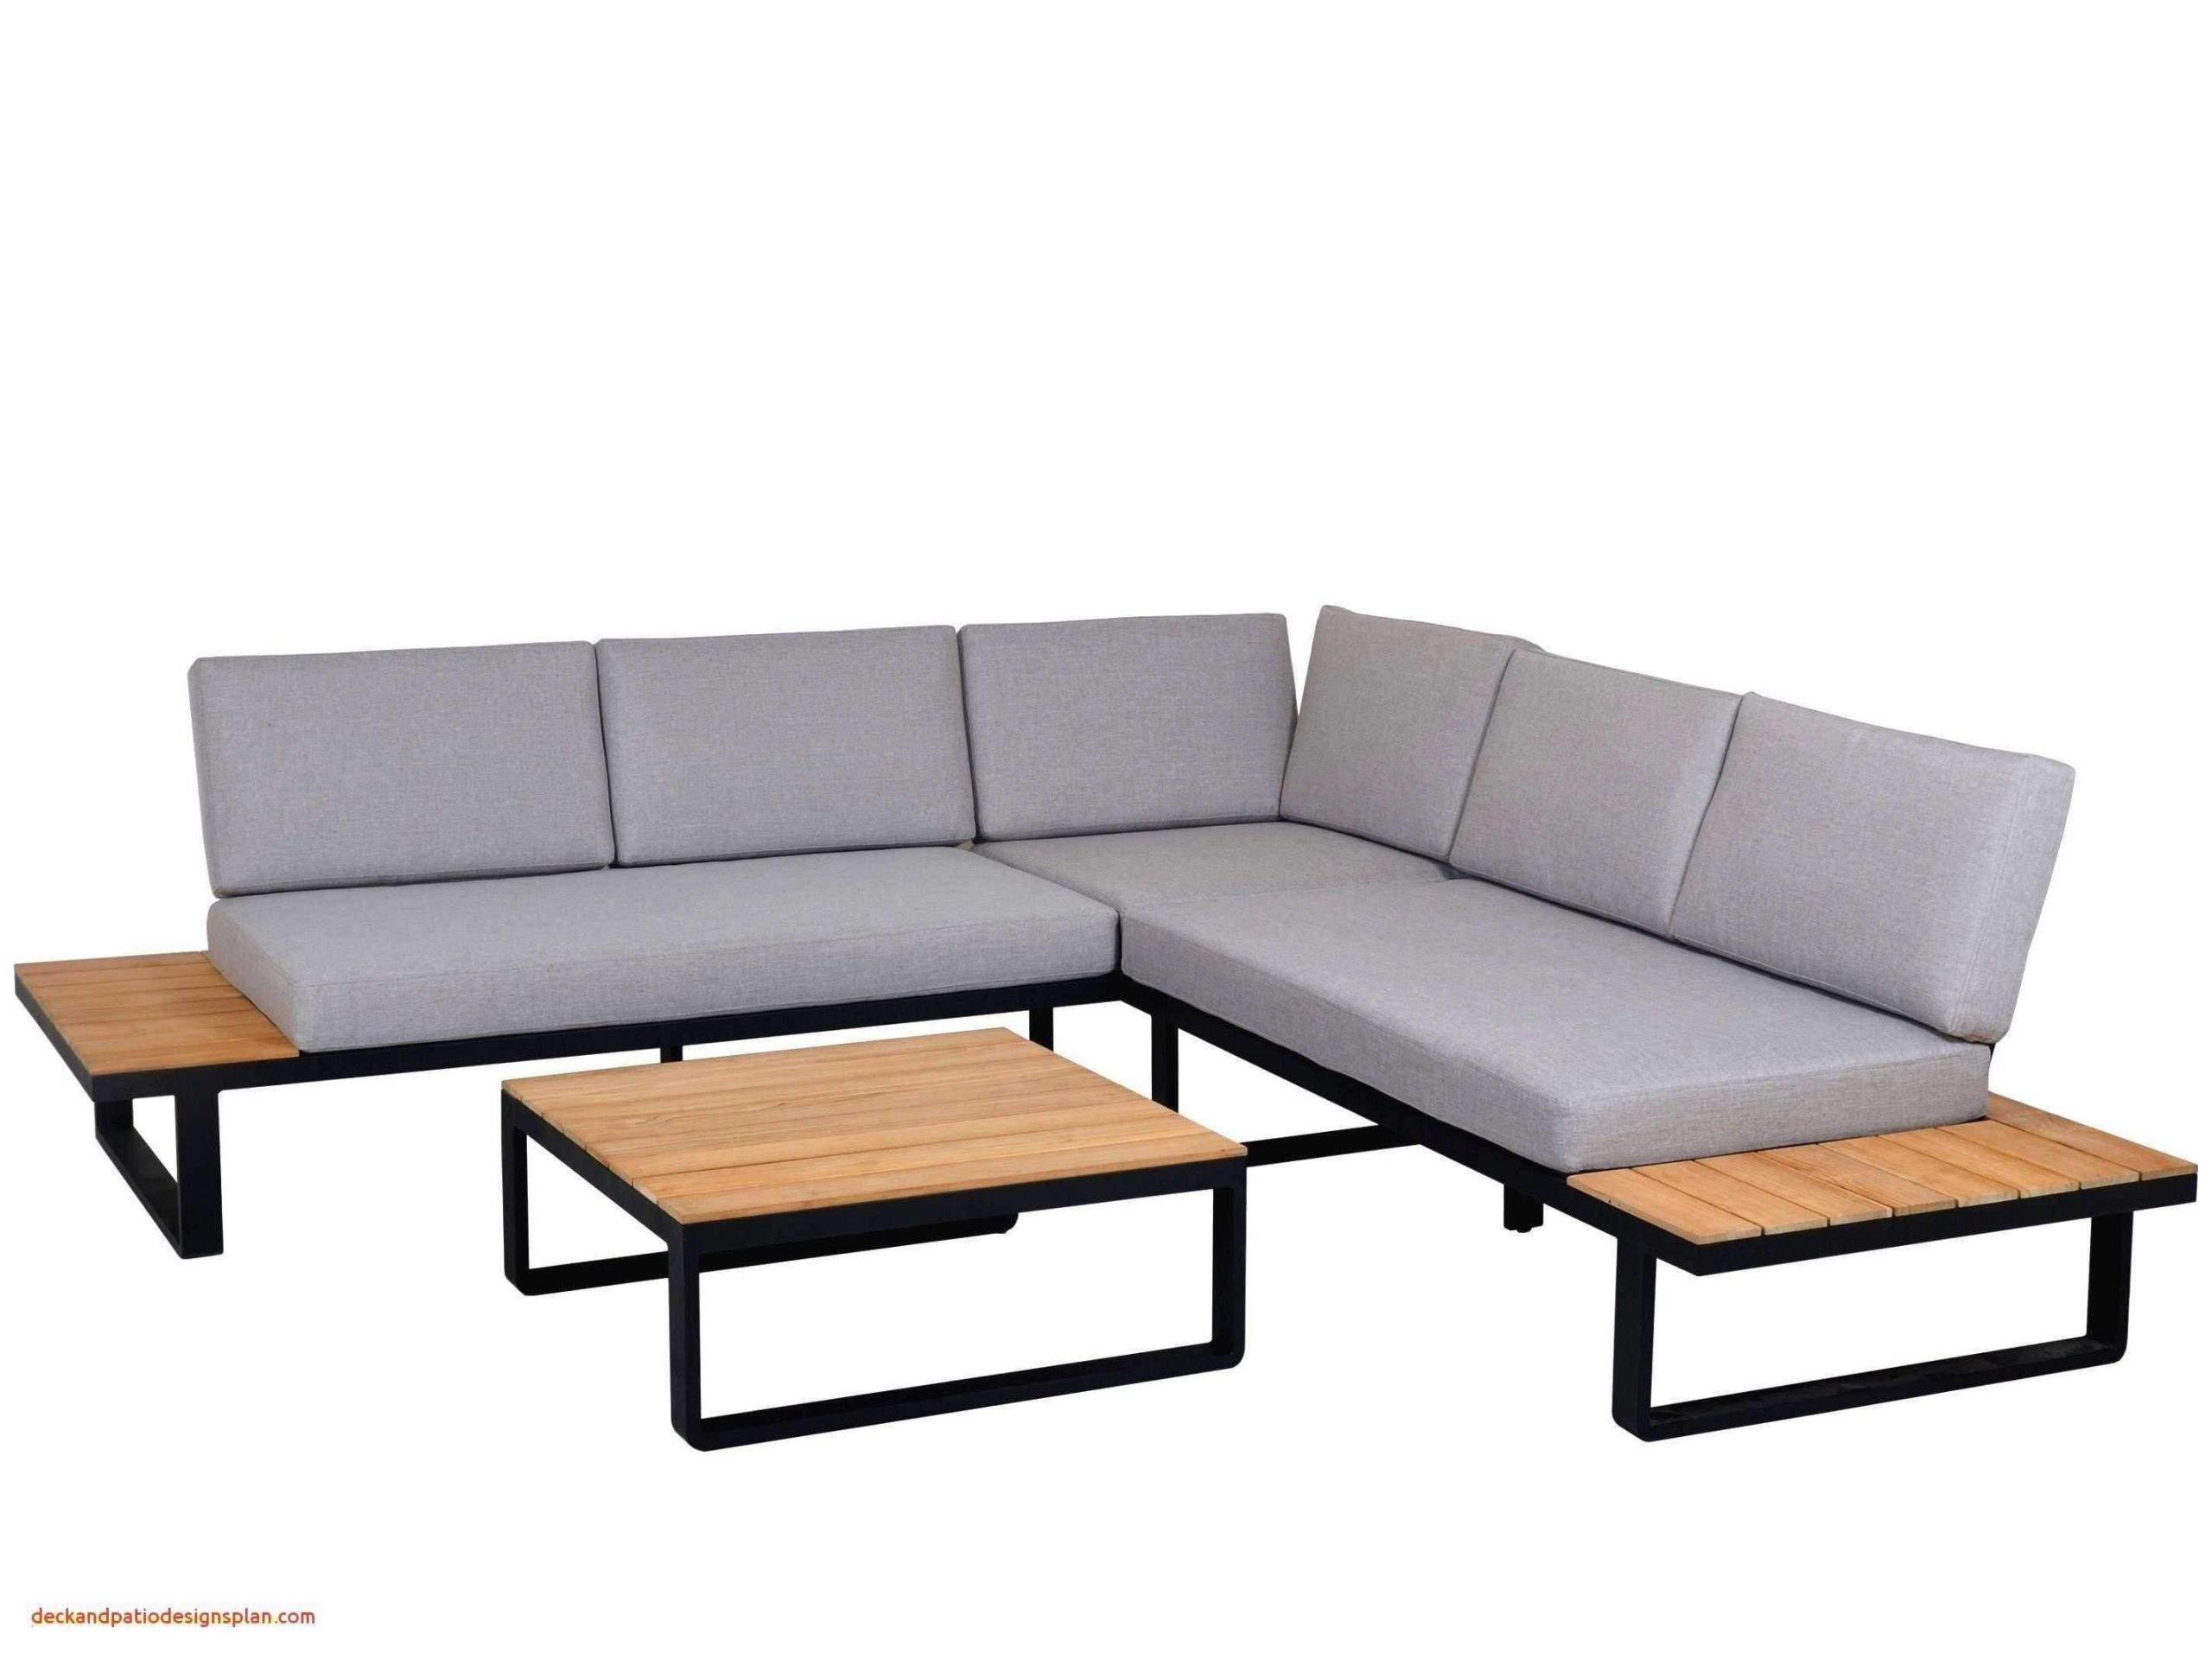 lounge ecksofa garten luxus 26 neu lounge sofa wohnzimmer inspirierend of lounge ecksofa garten